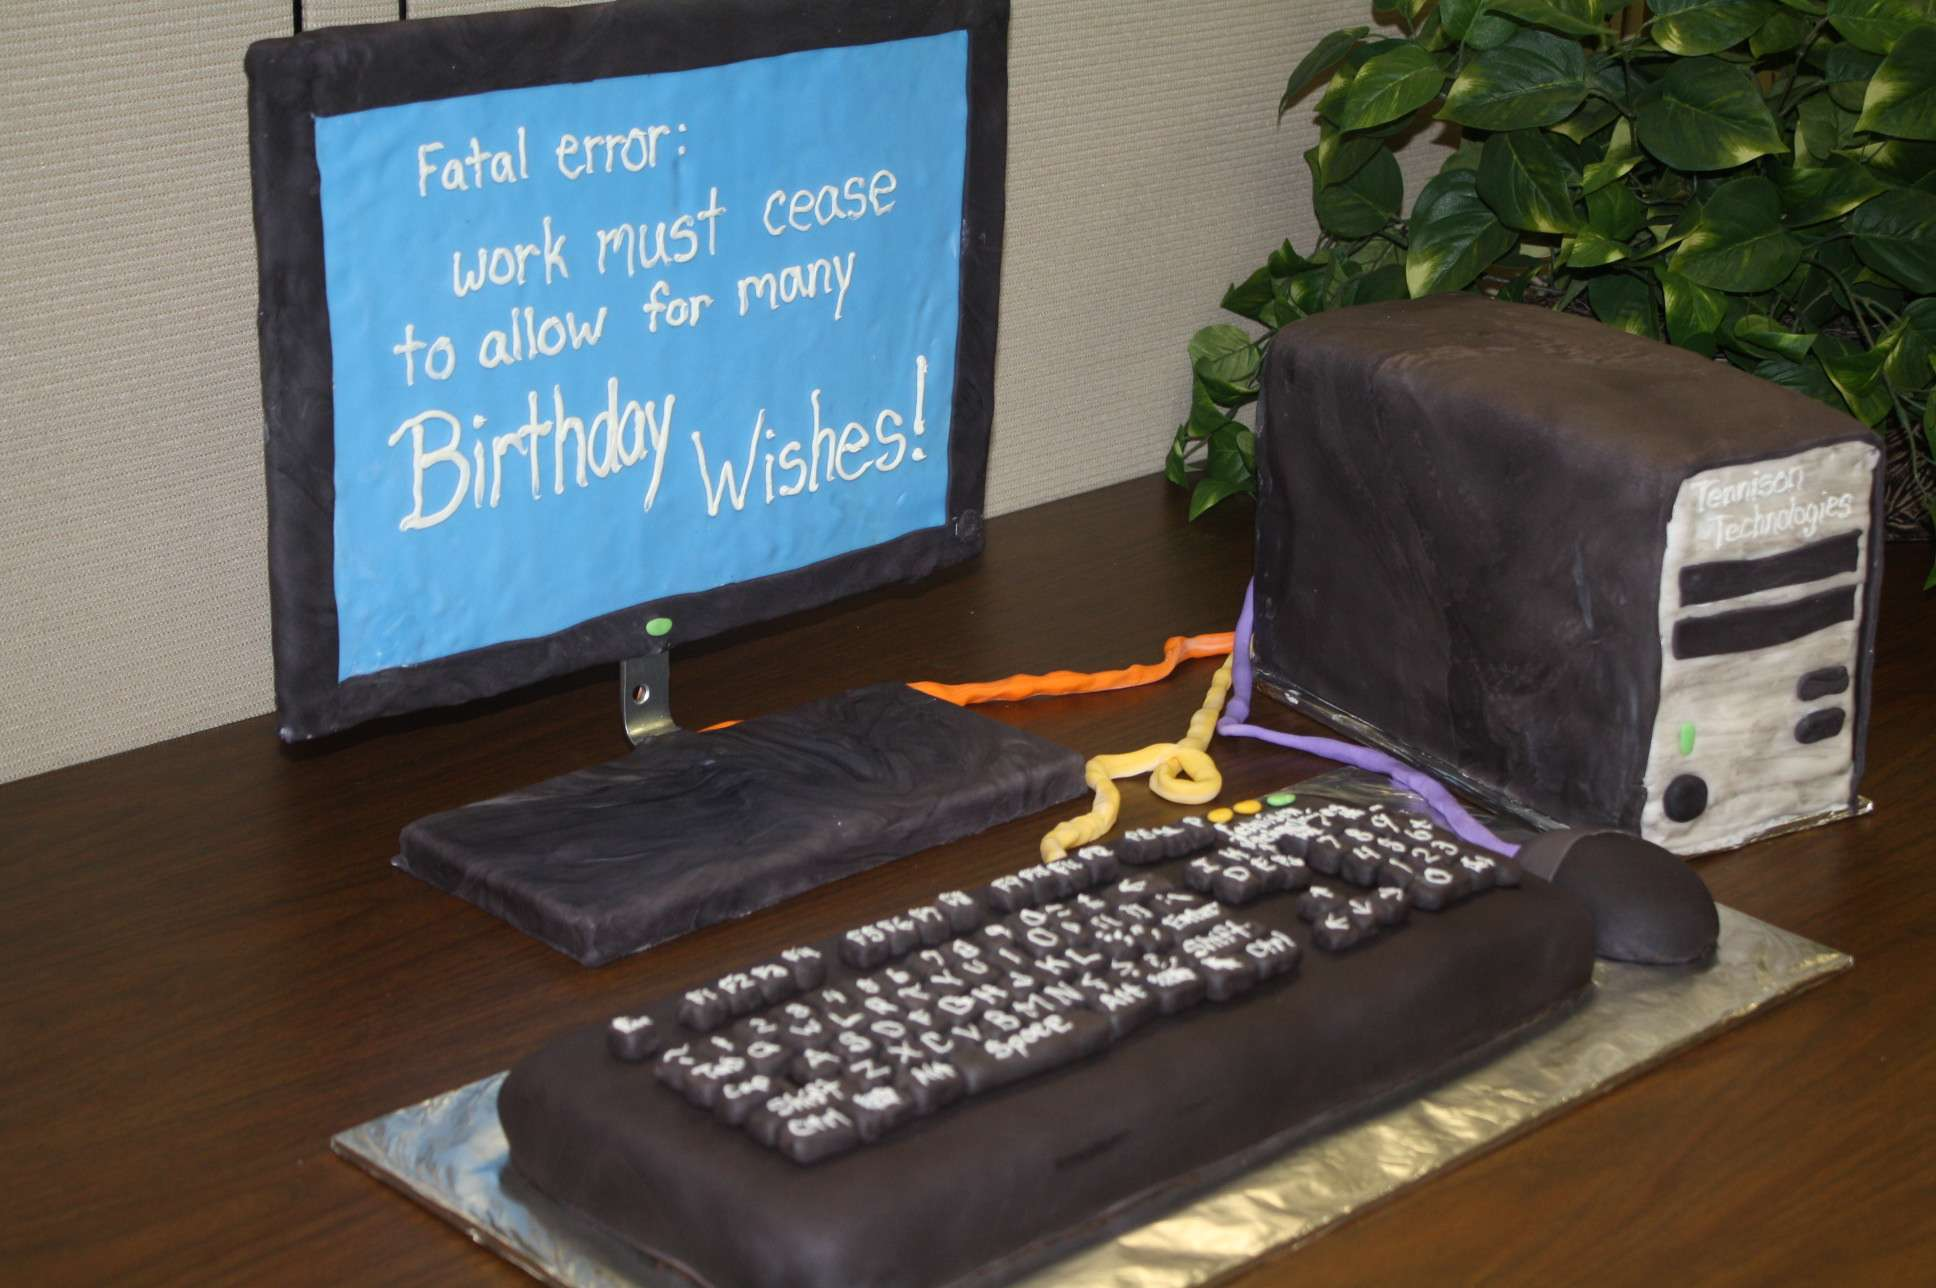 http://www.theeffect.net/wp-content/uploads/2013/03/Computer-Cake.jpg